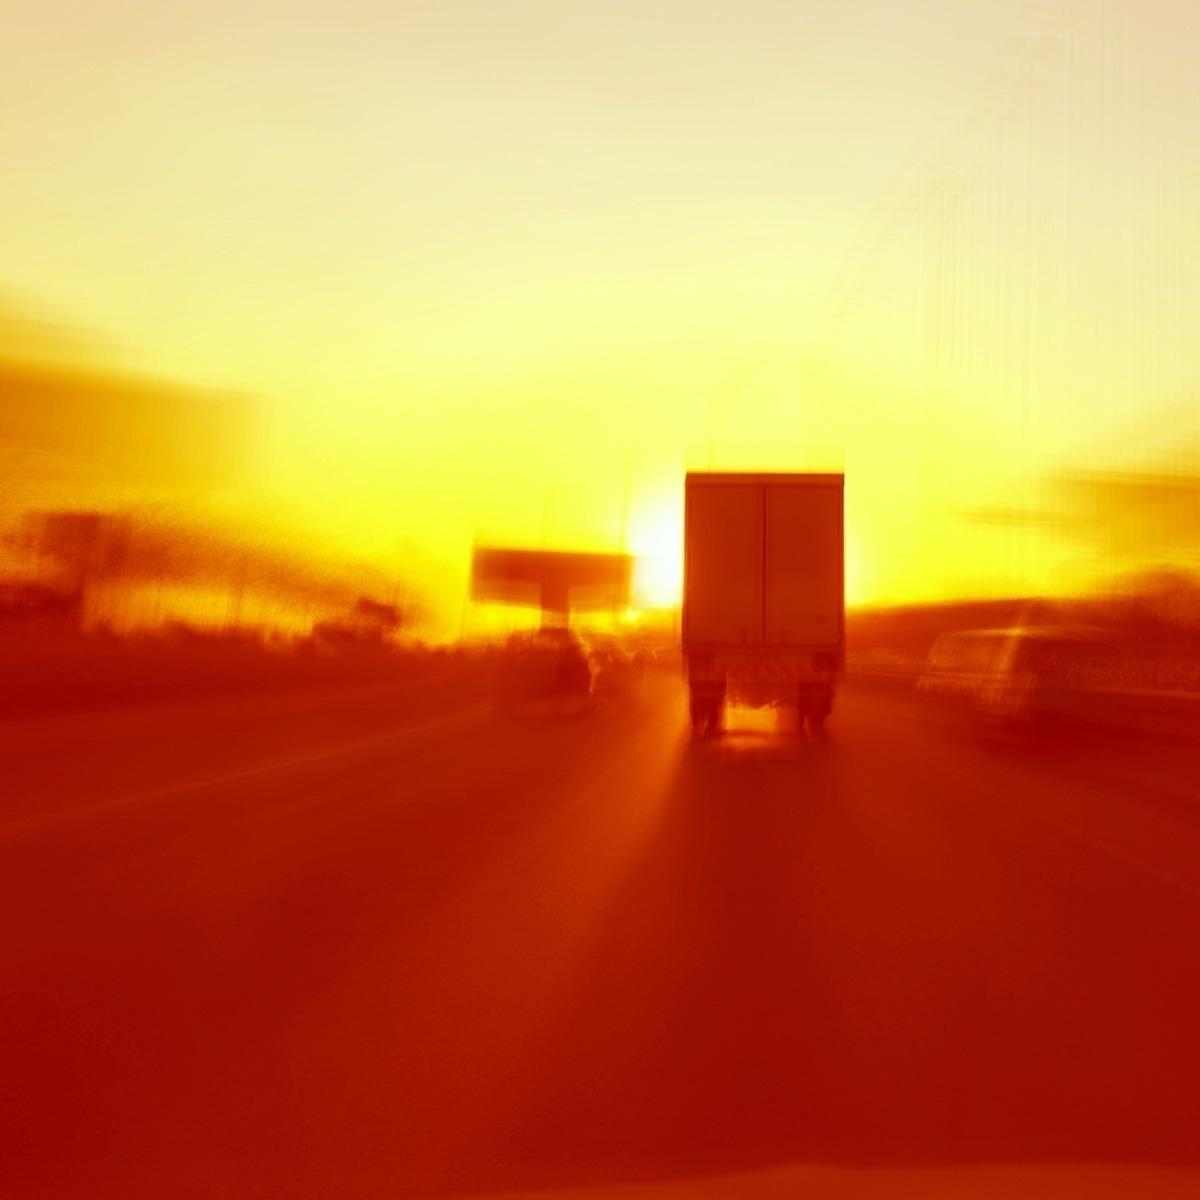 Sunset Delivery - shot iPhone 5 - lioneldp | ello